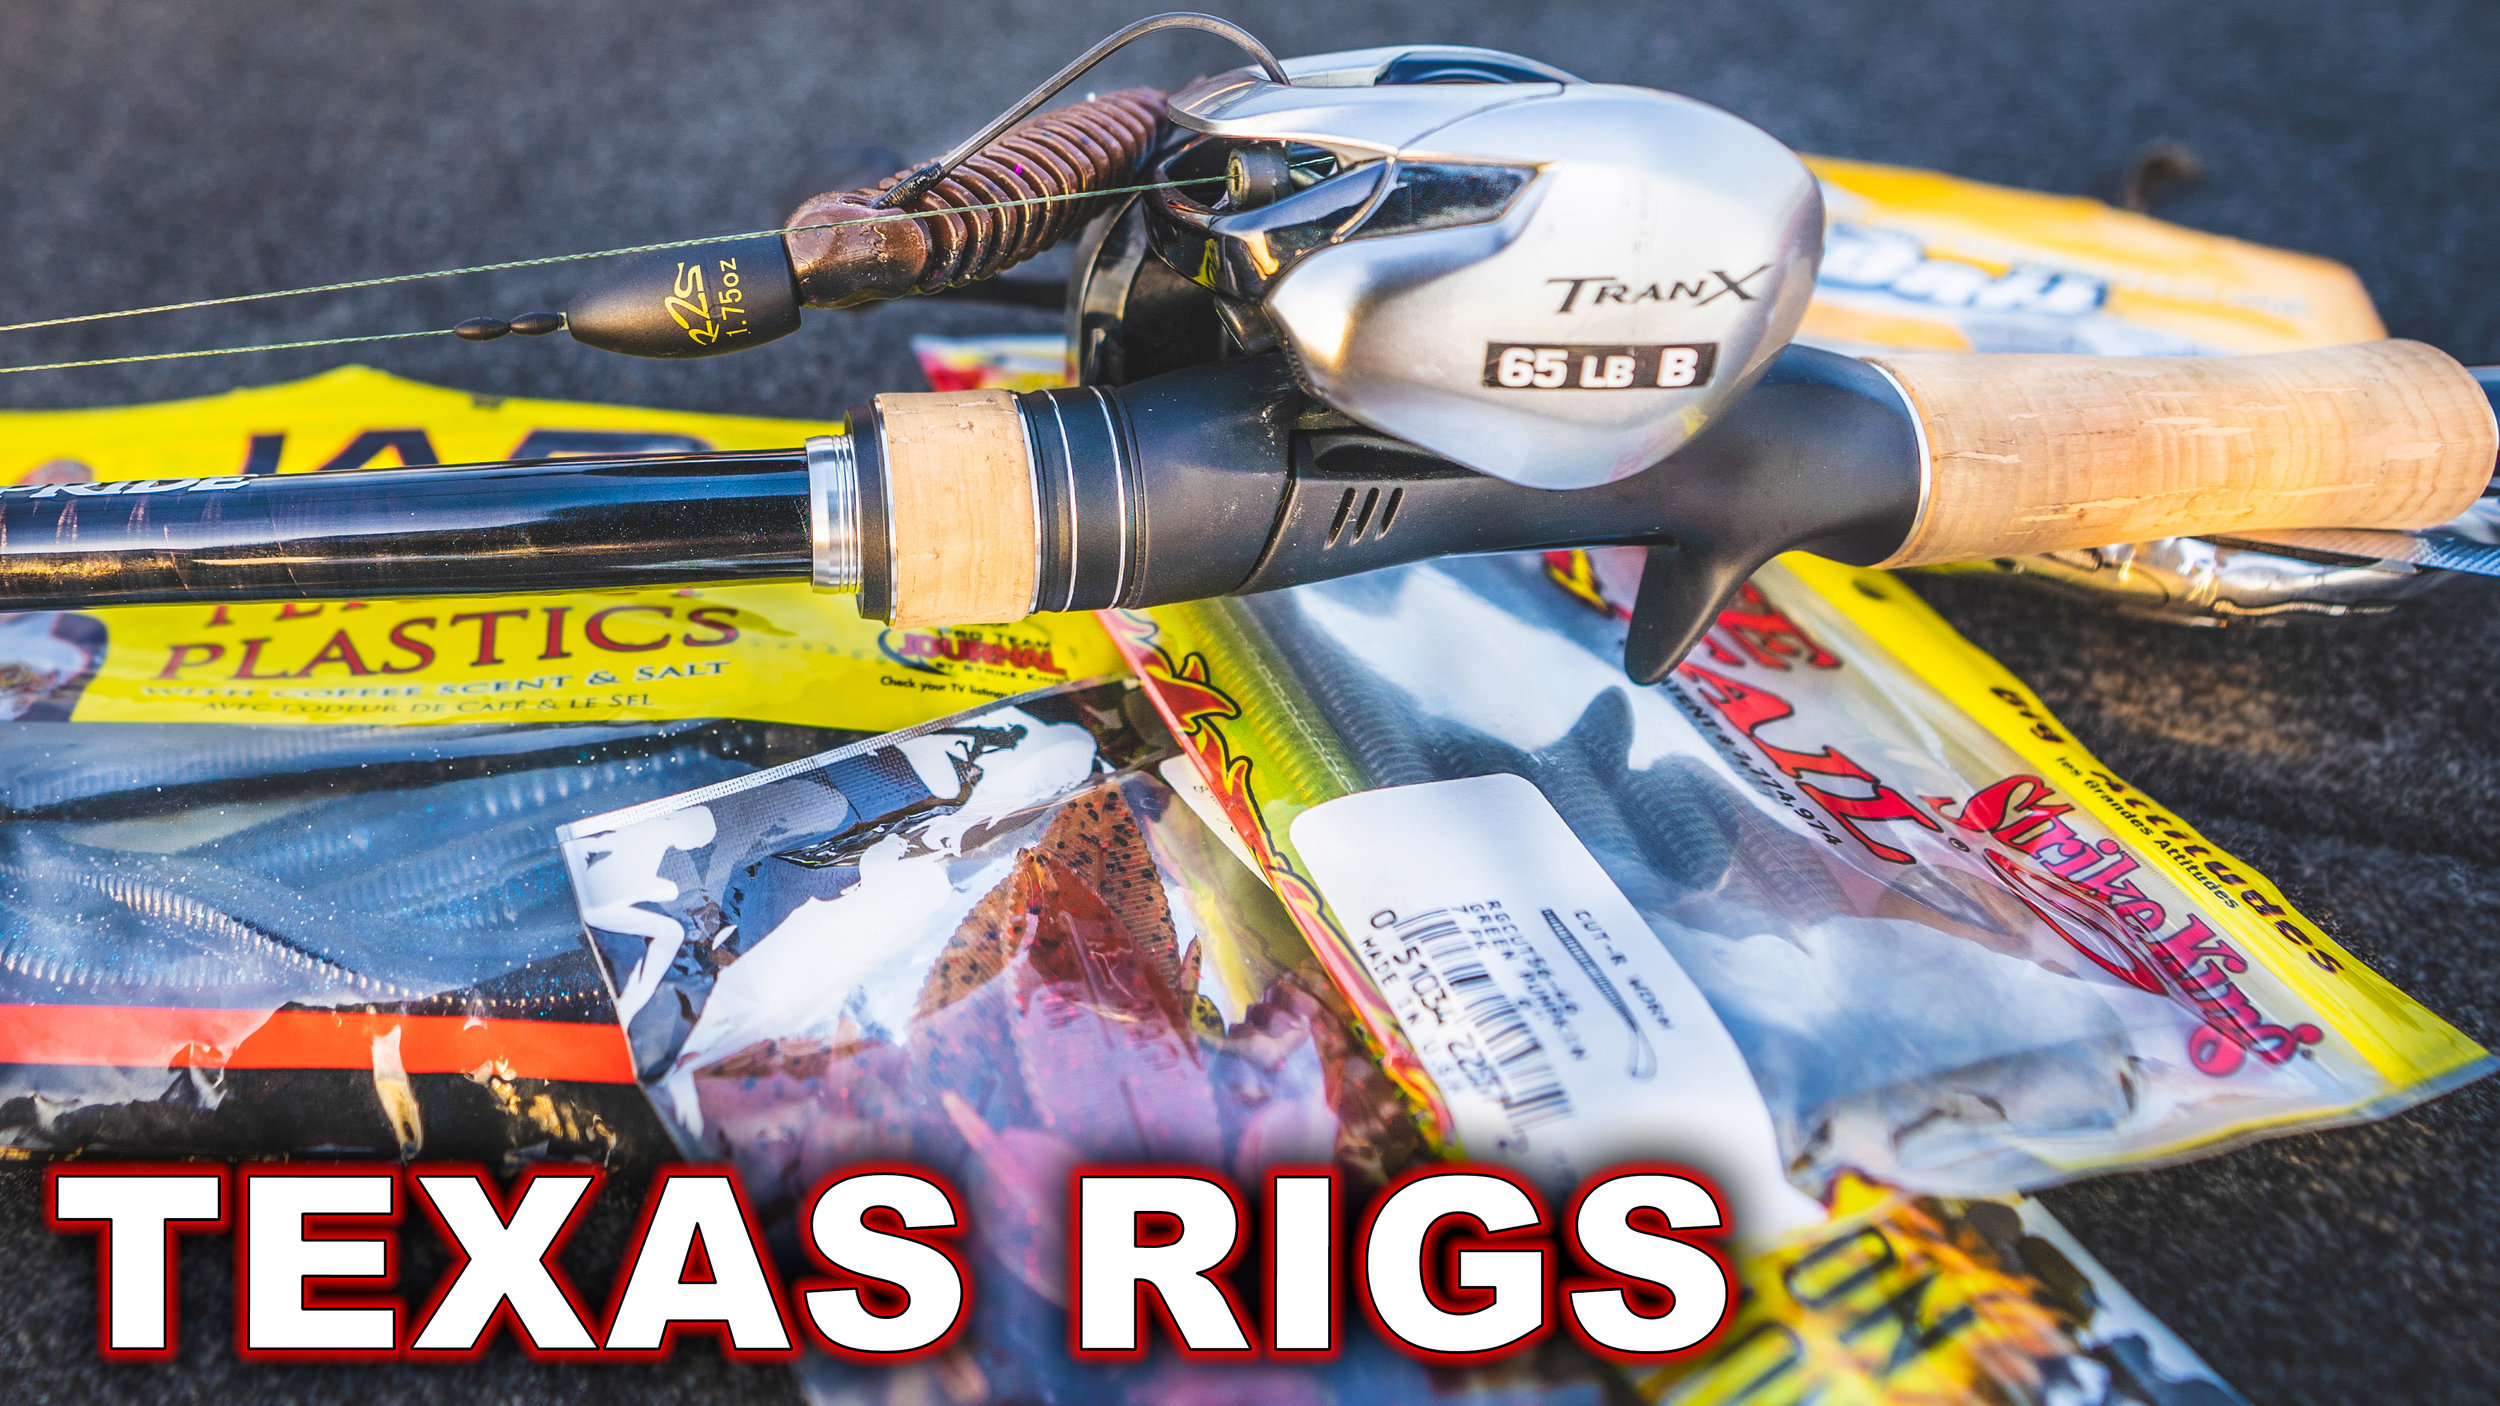 Texas Rigs 3.jpg